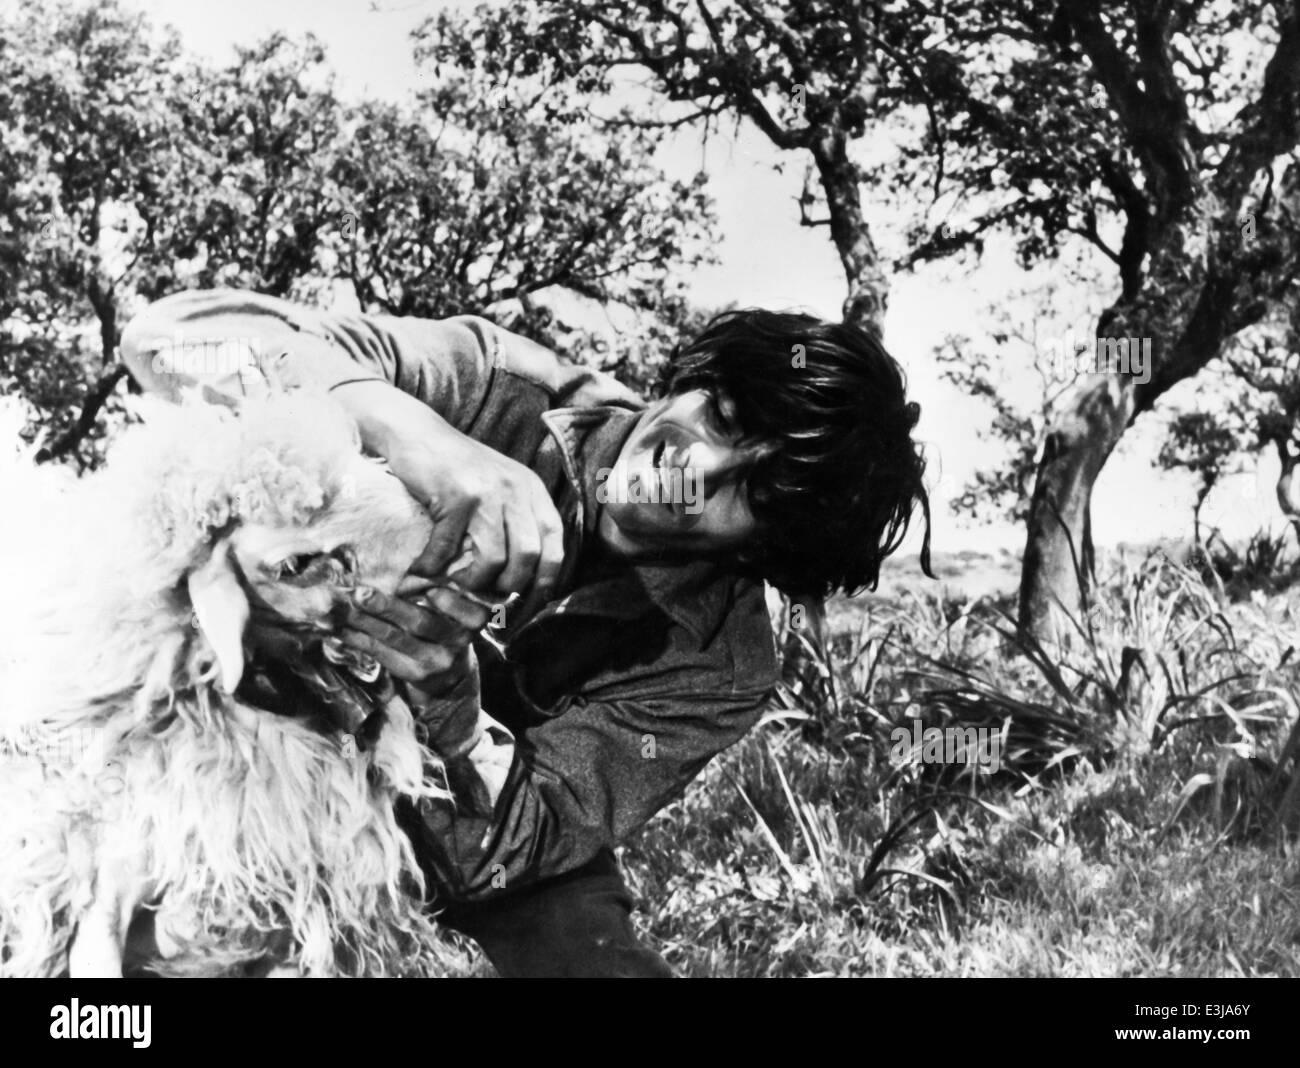 Gavino ledda,ybris,1983 Imagen De Stock